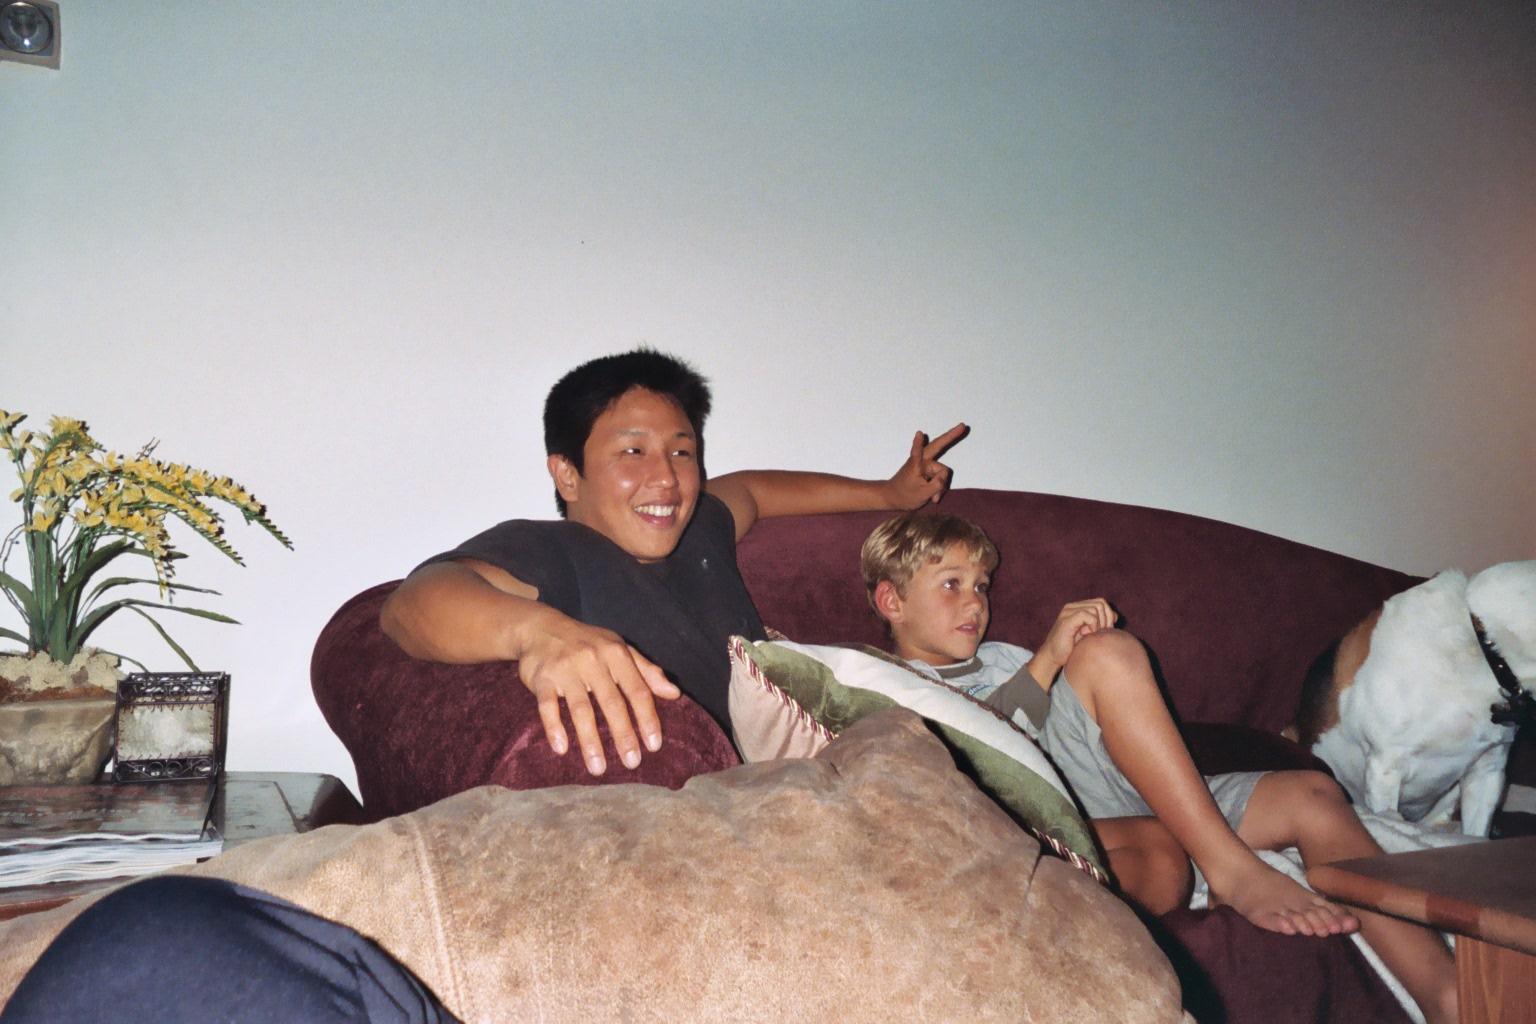 Sweet Prince and Sports Boy Feb 2004